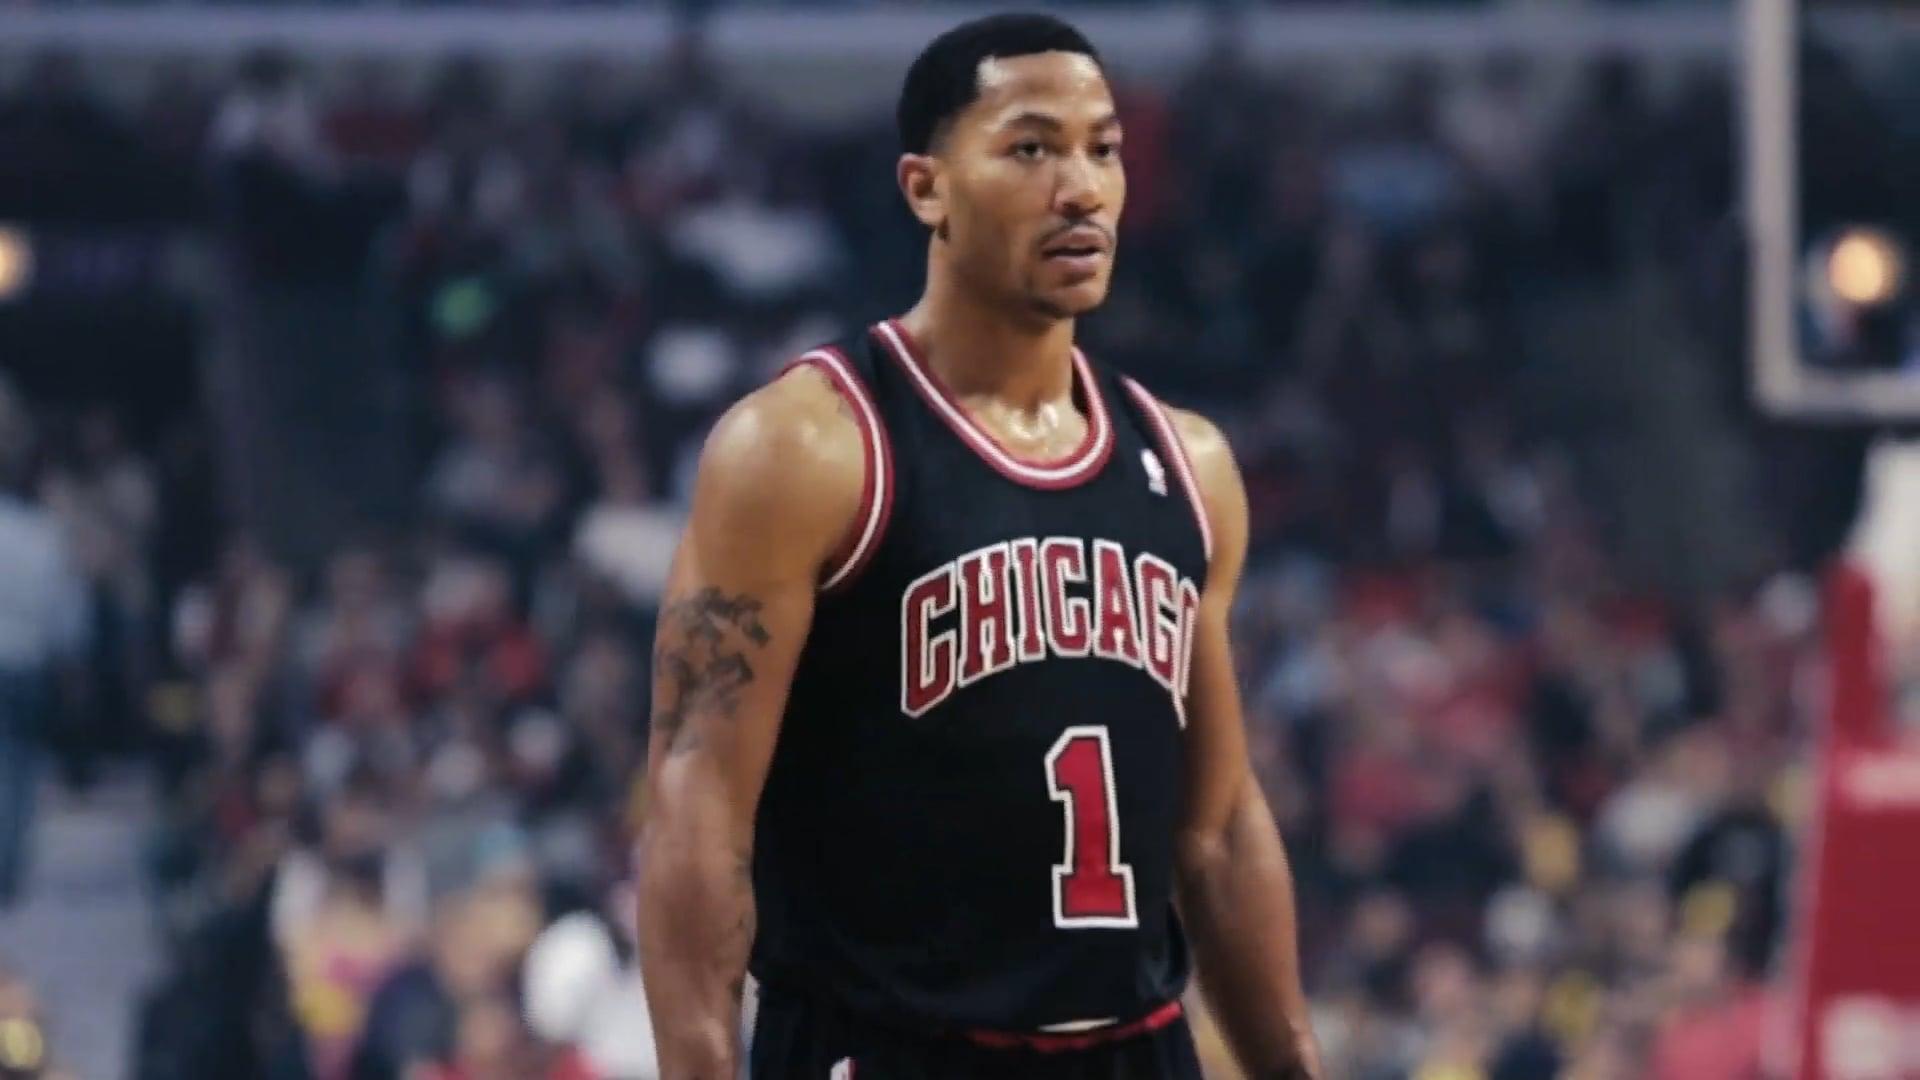 Chicago Basketball Is Golden: Tip-Off